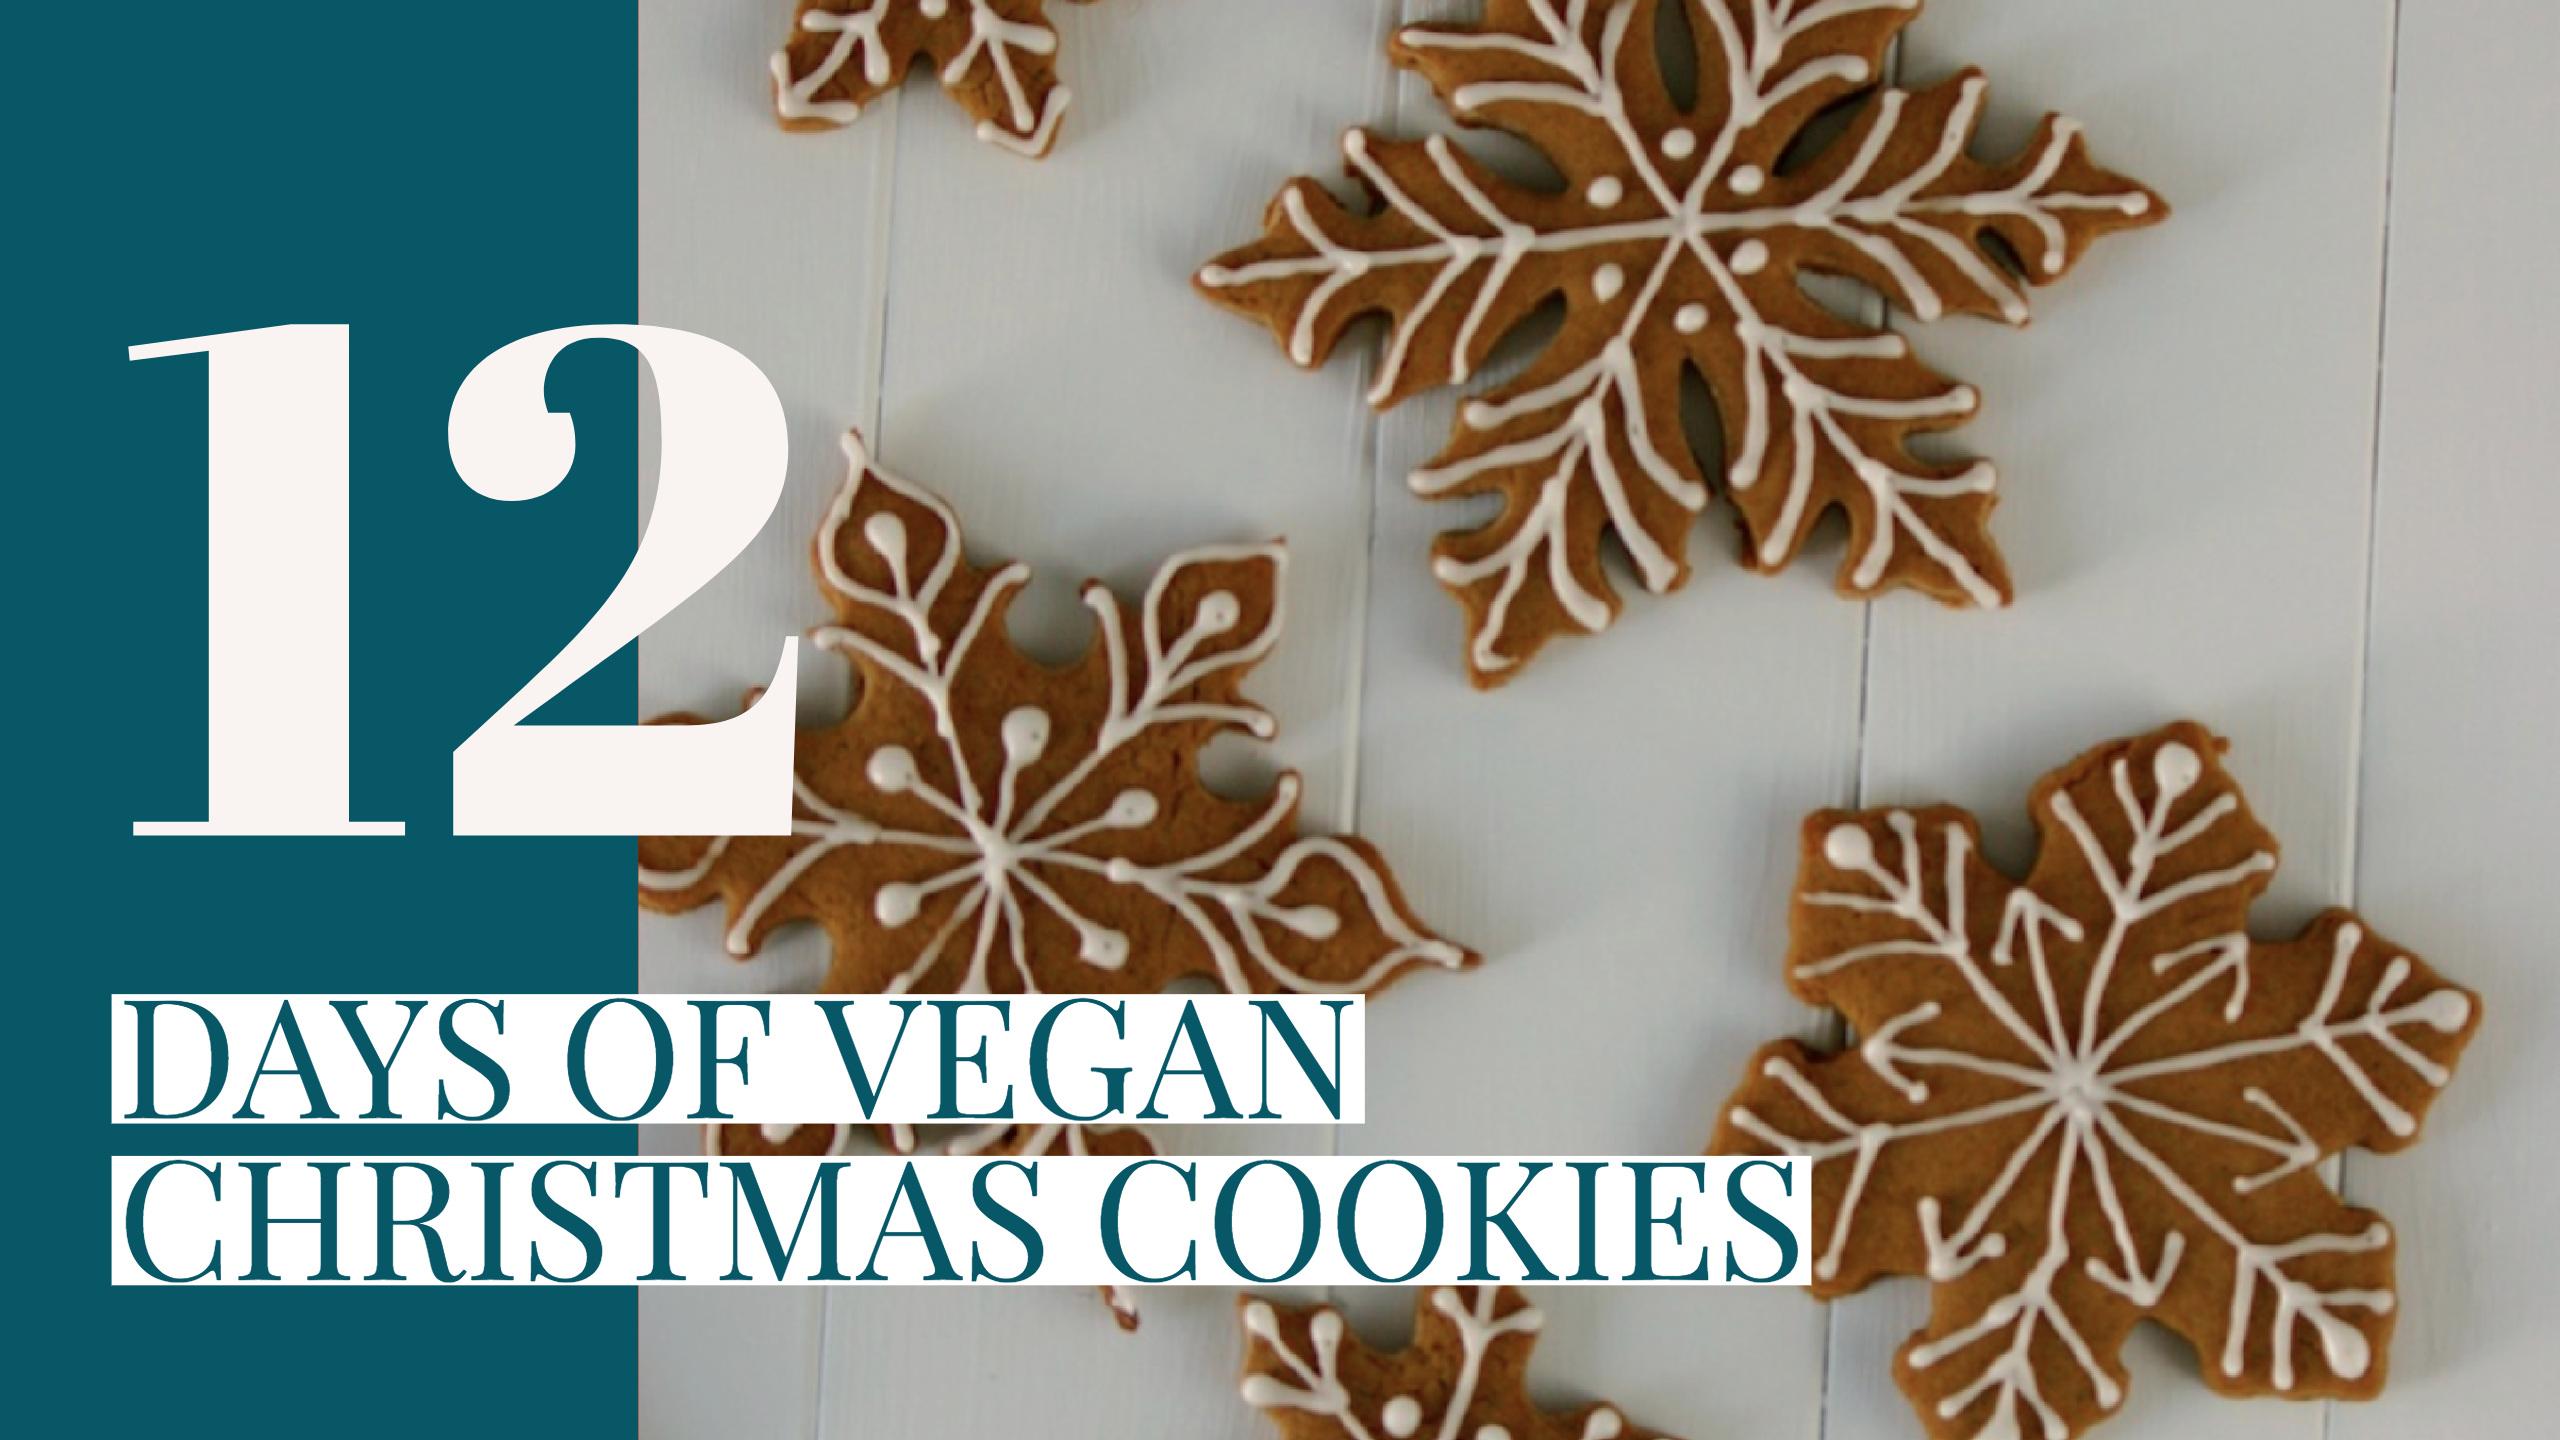 12 Day of Vegan Christmas Cookies